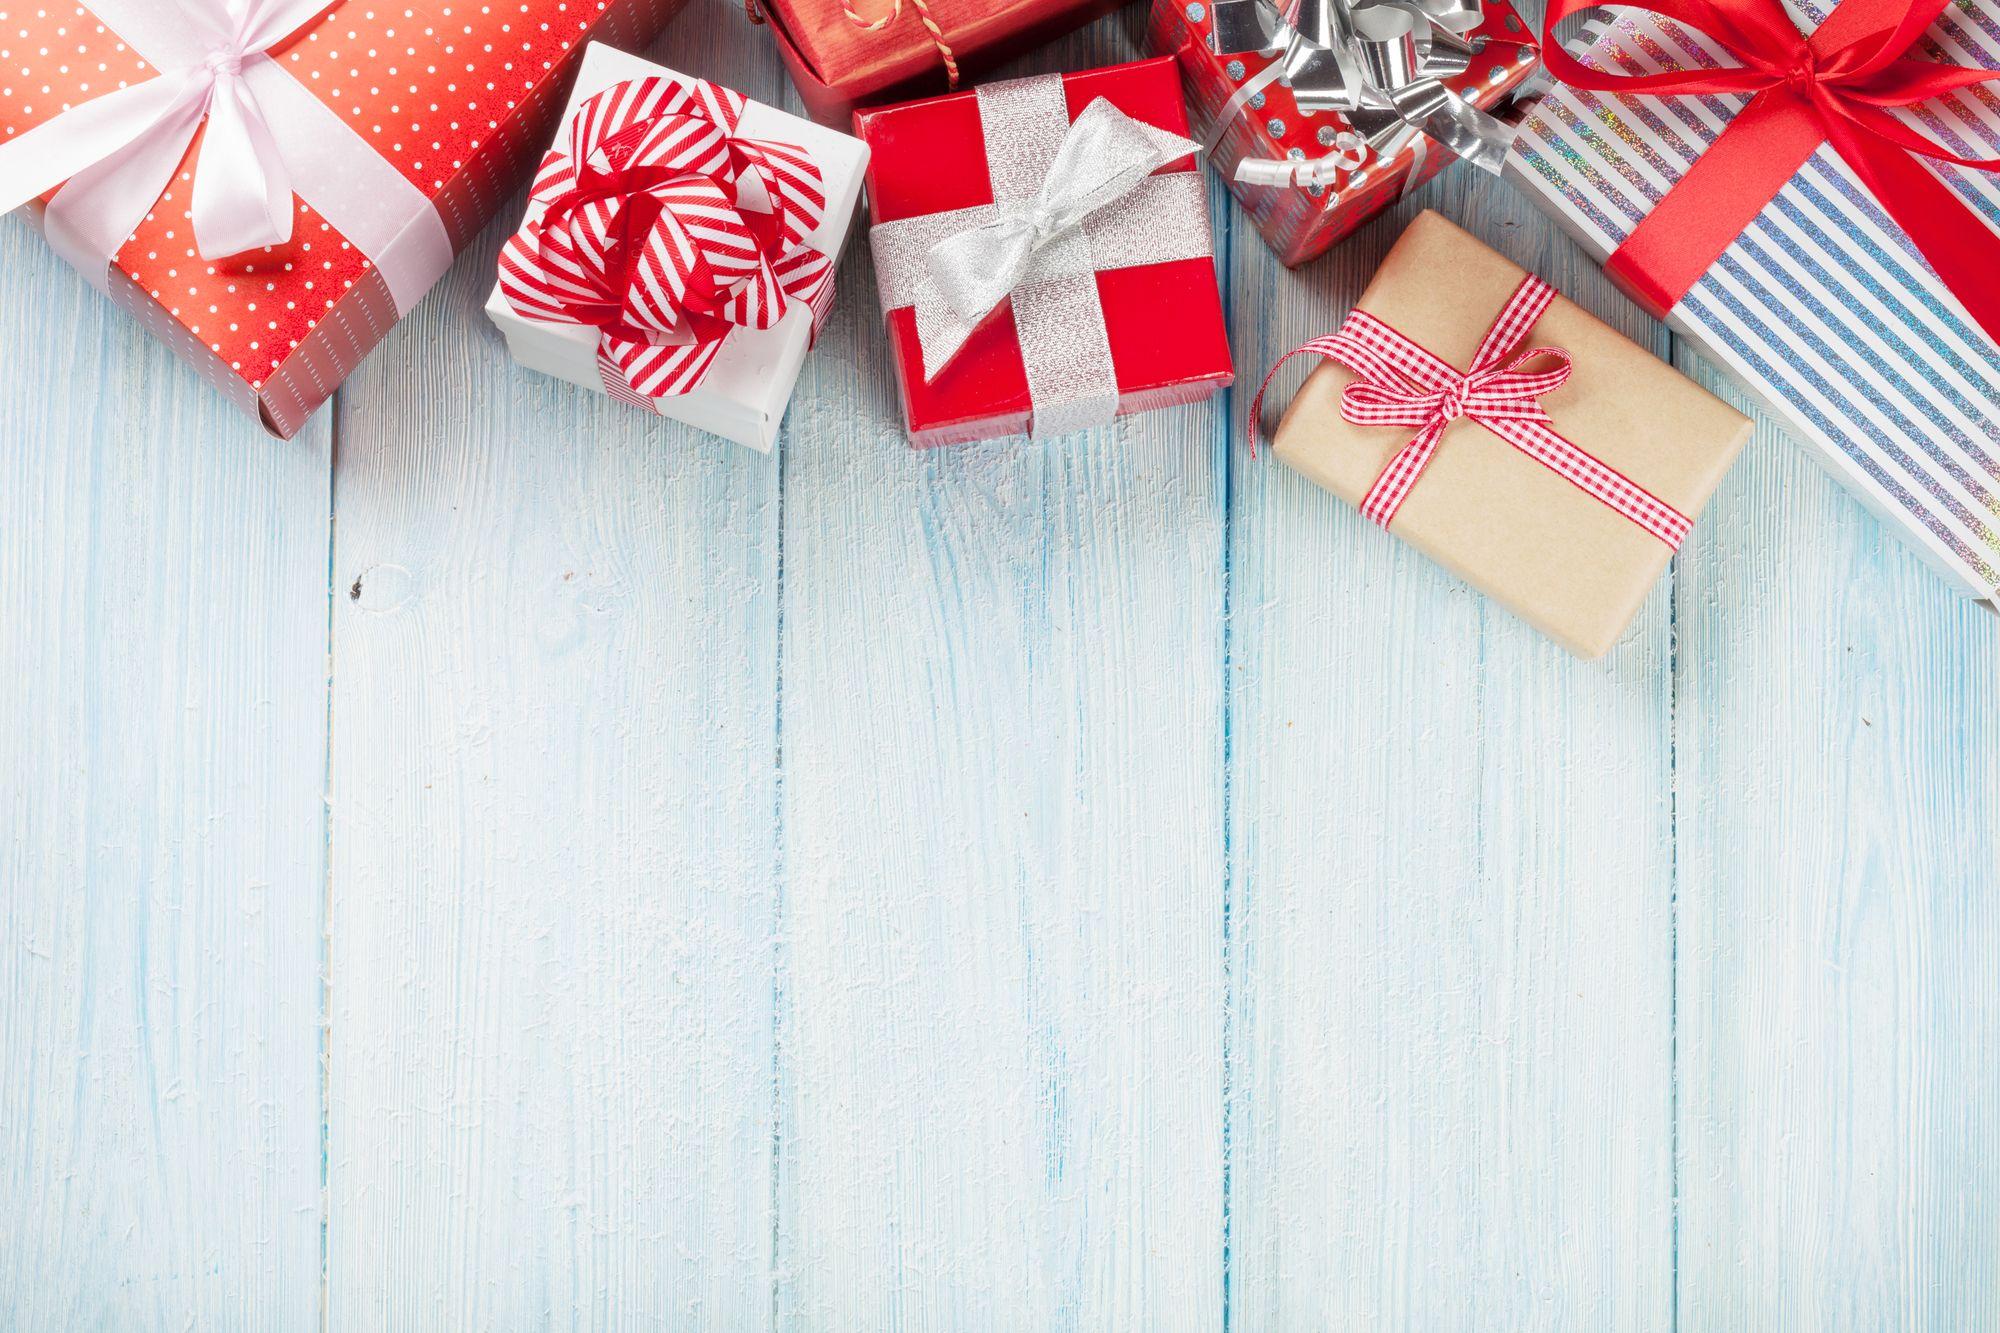 10 gift ideas every runner will love